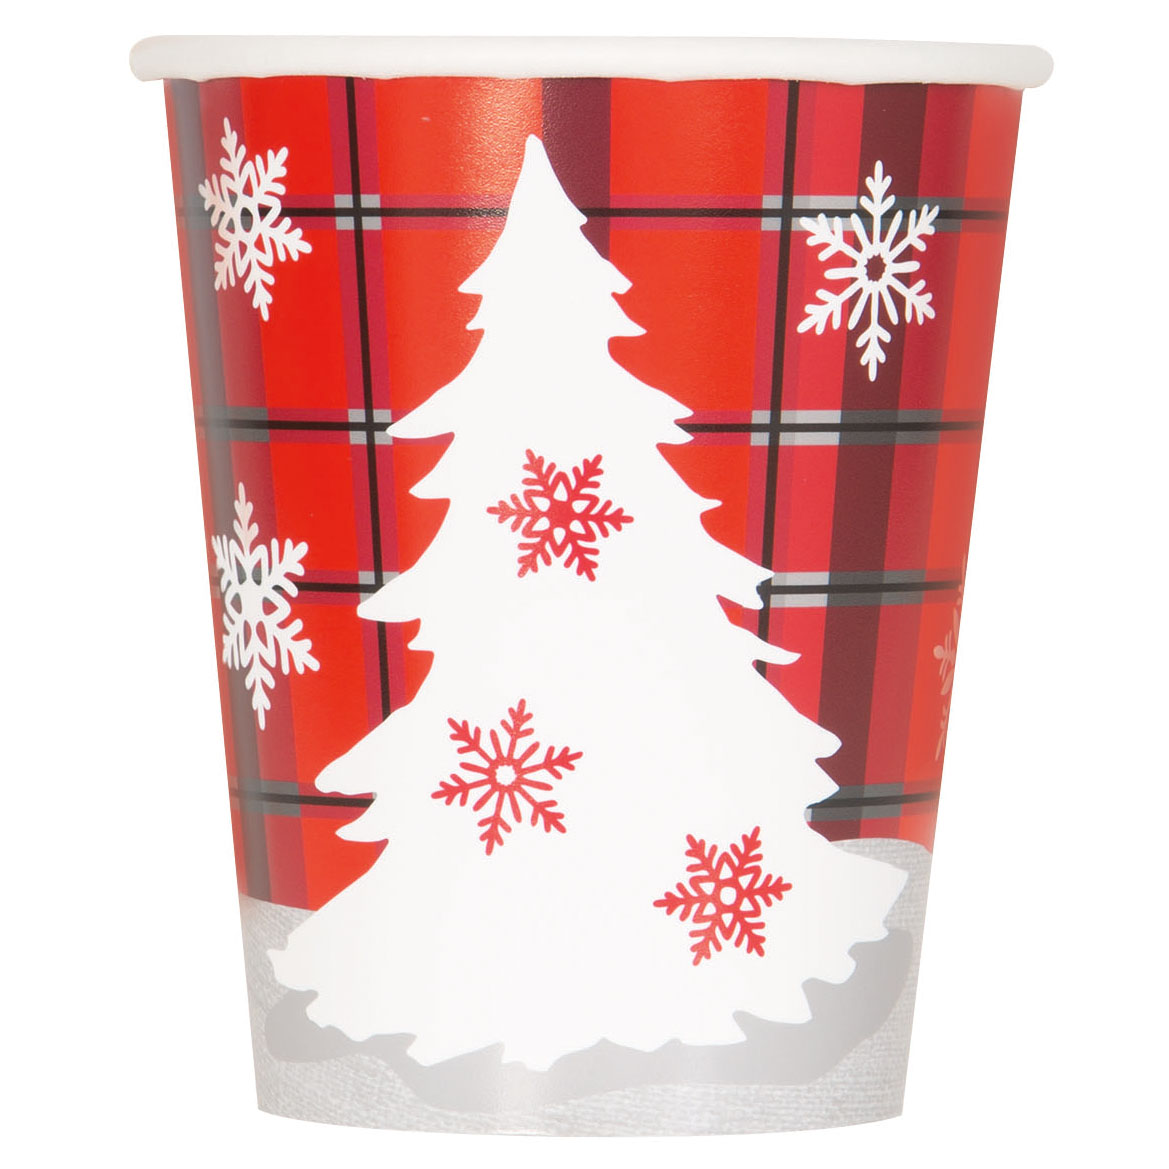 9oz Paper Rustic Plaid Christmas Cups, 8ct